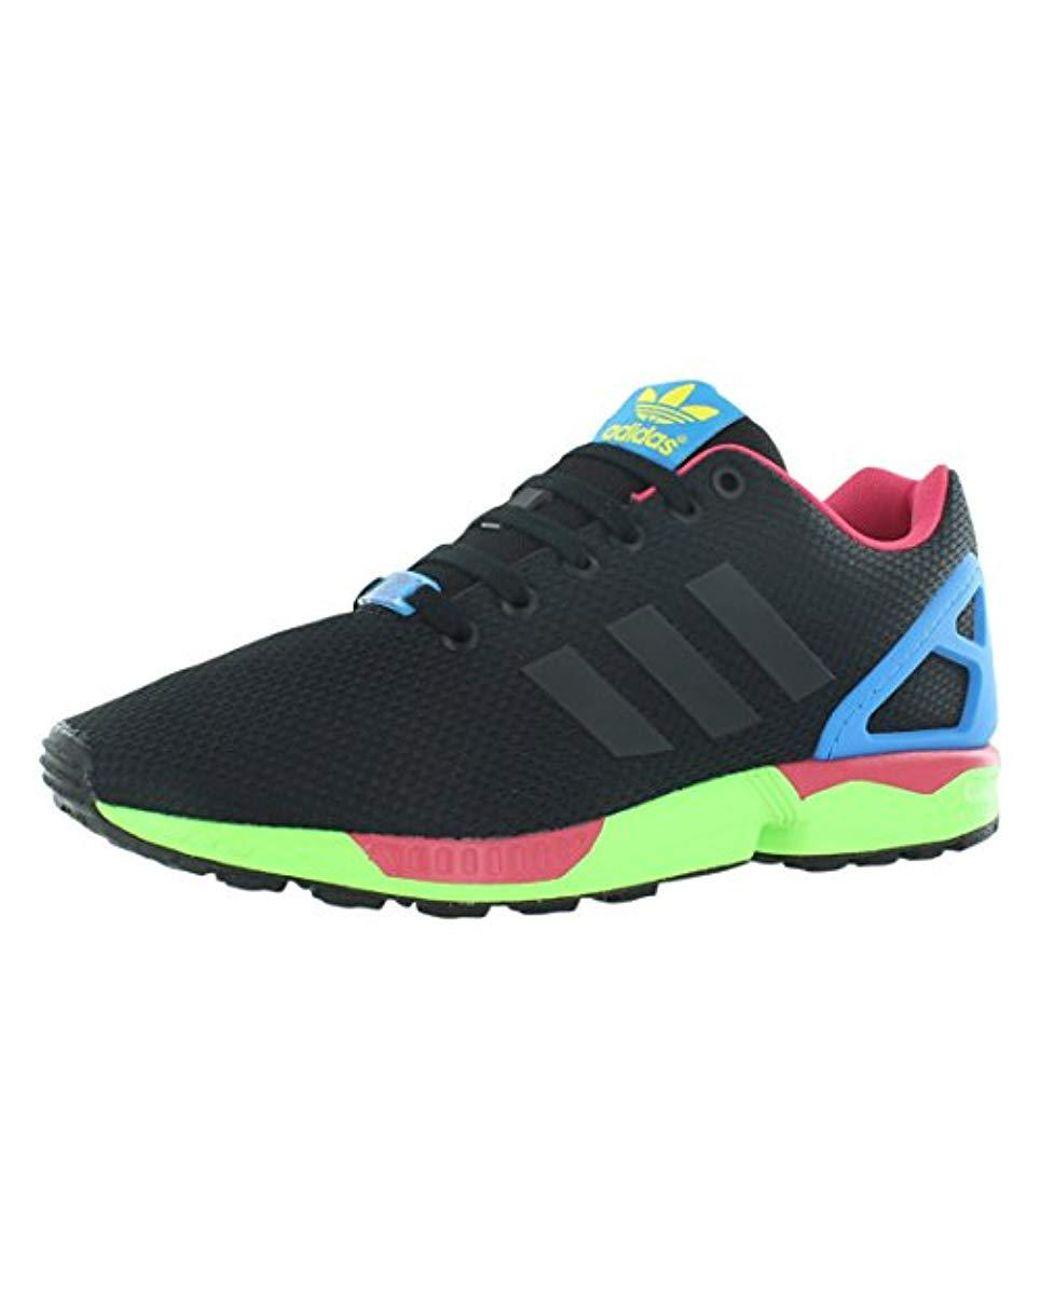 9f5b4ec769d63 Lyst - adidas Originals Zx Flux Sneaker in Black for Men